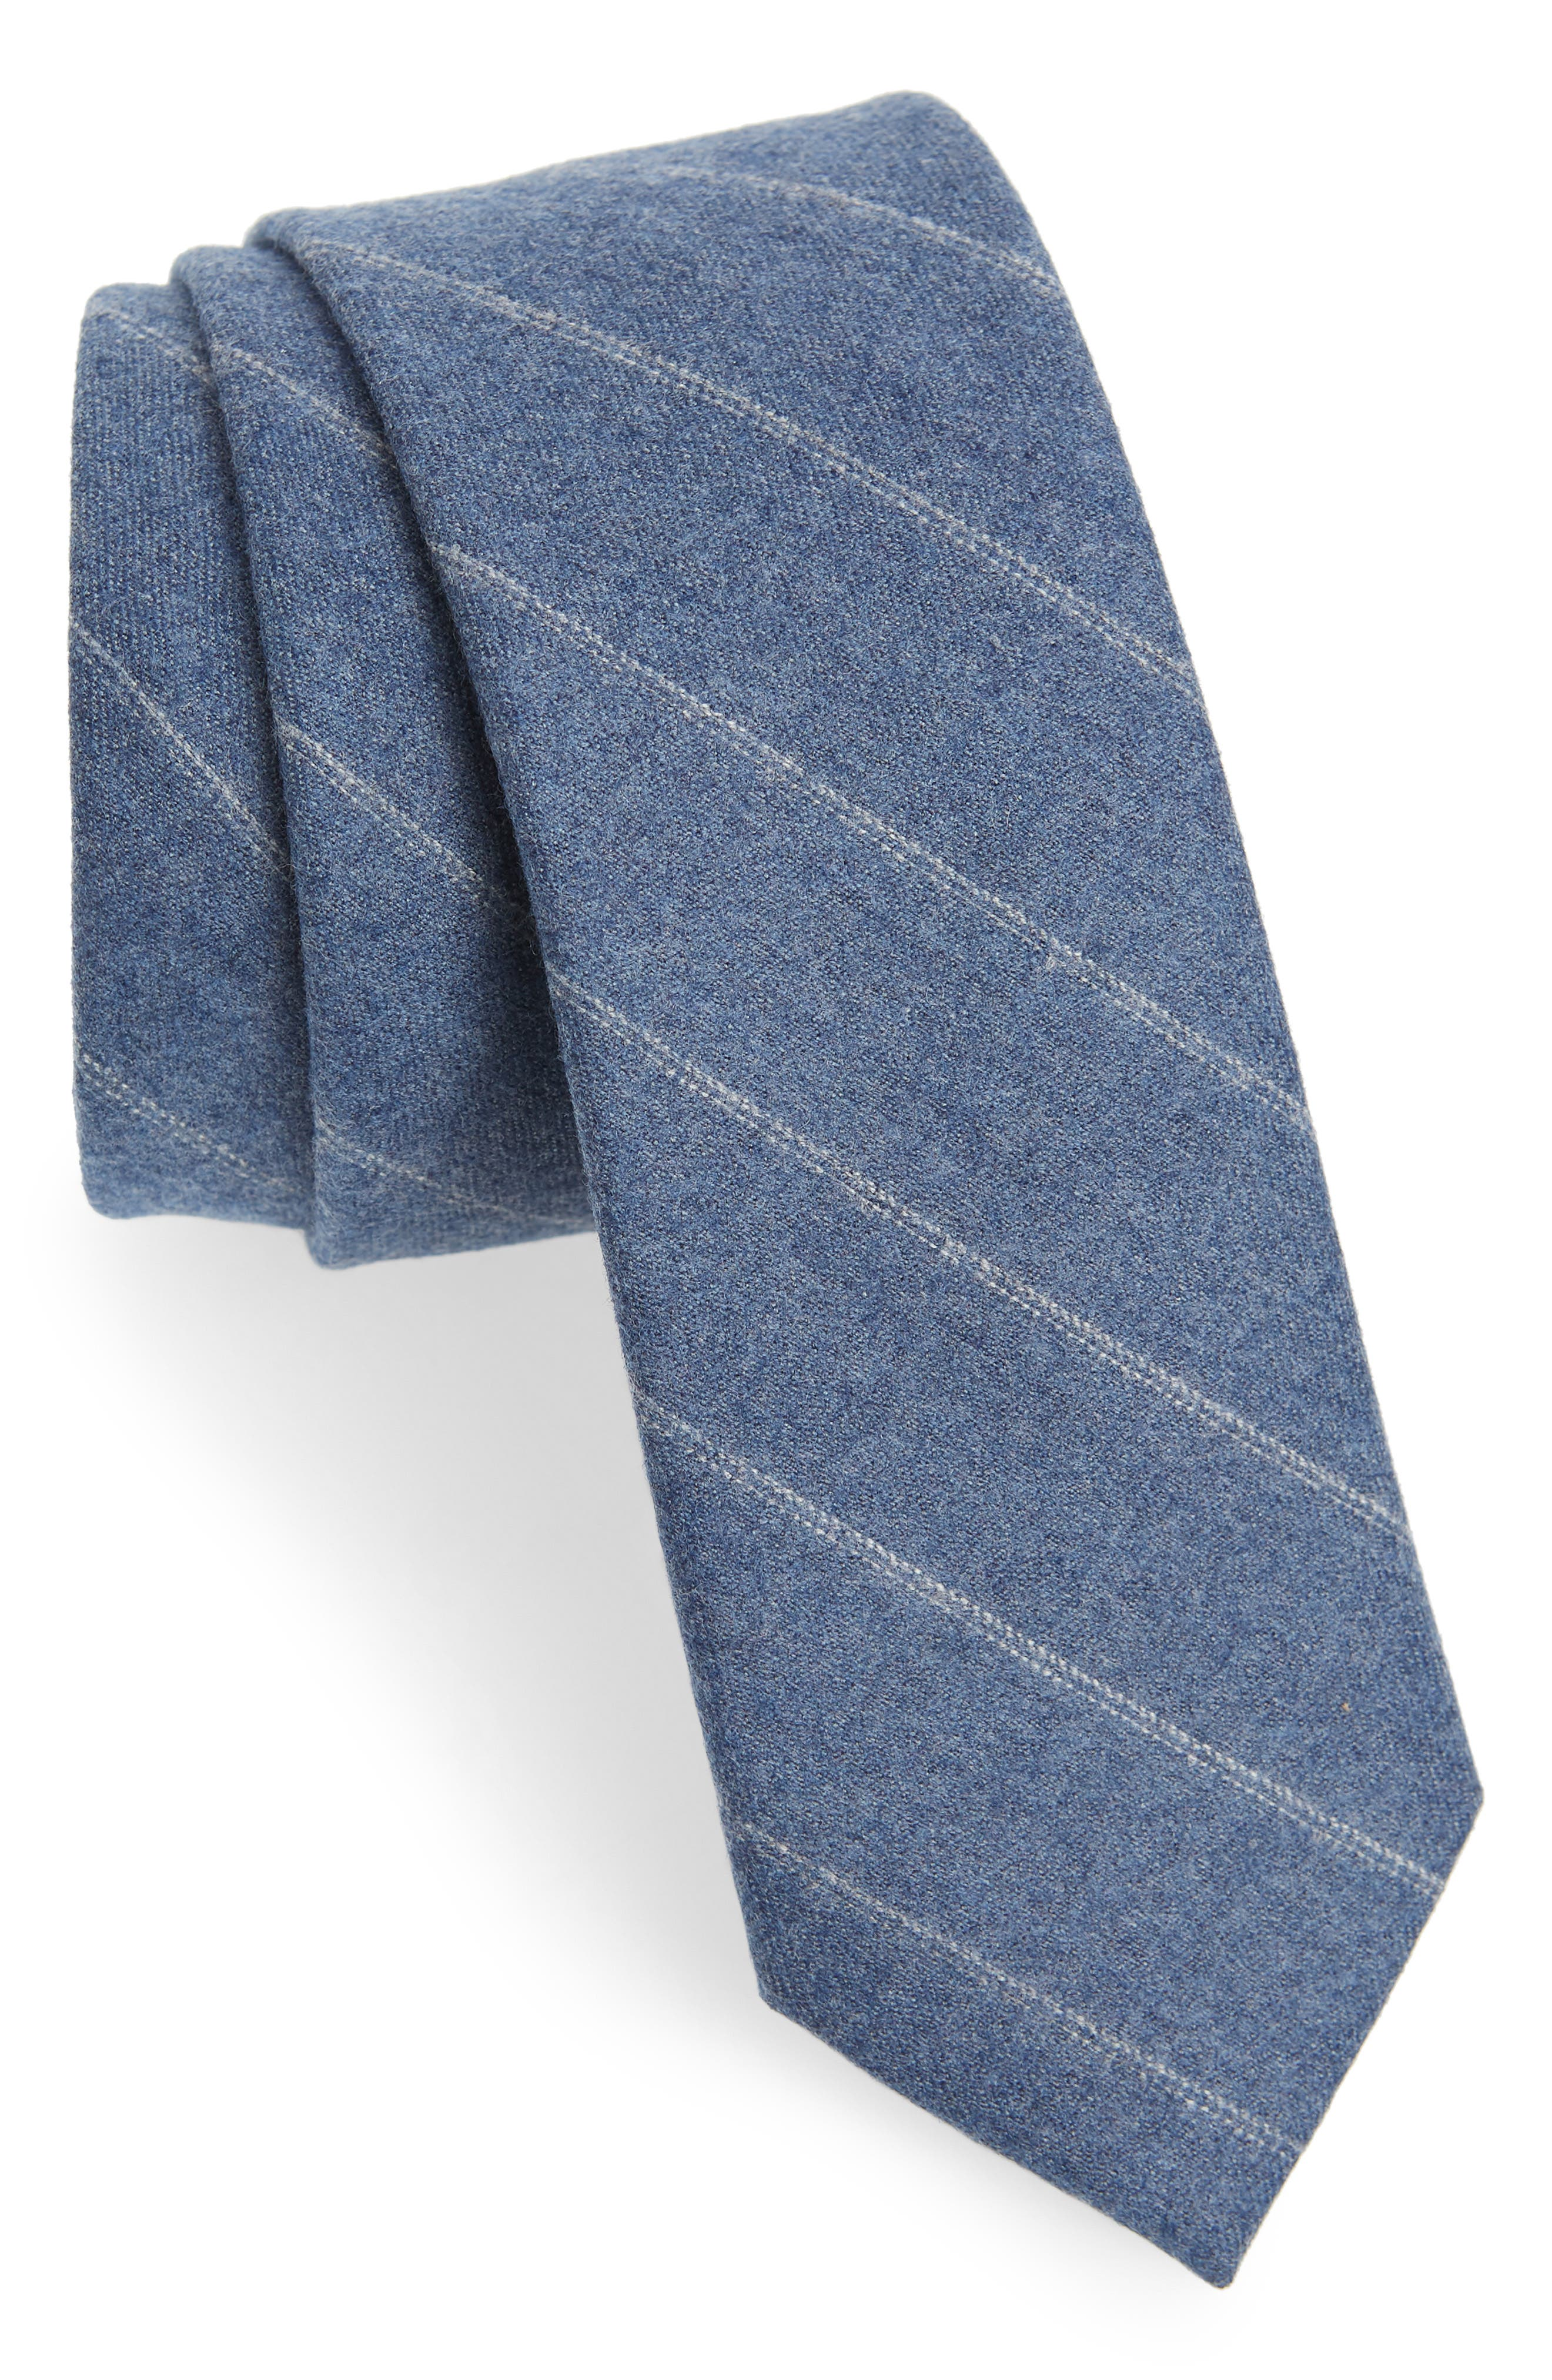 THE TIE BAR Giallo Stripe Wool Tie, Main, color, LIGHT BLUE